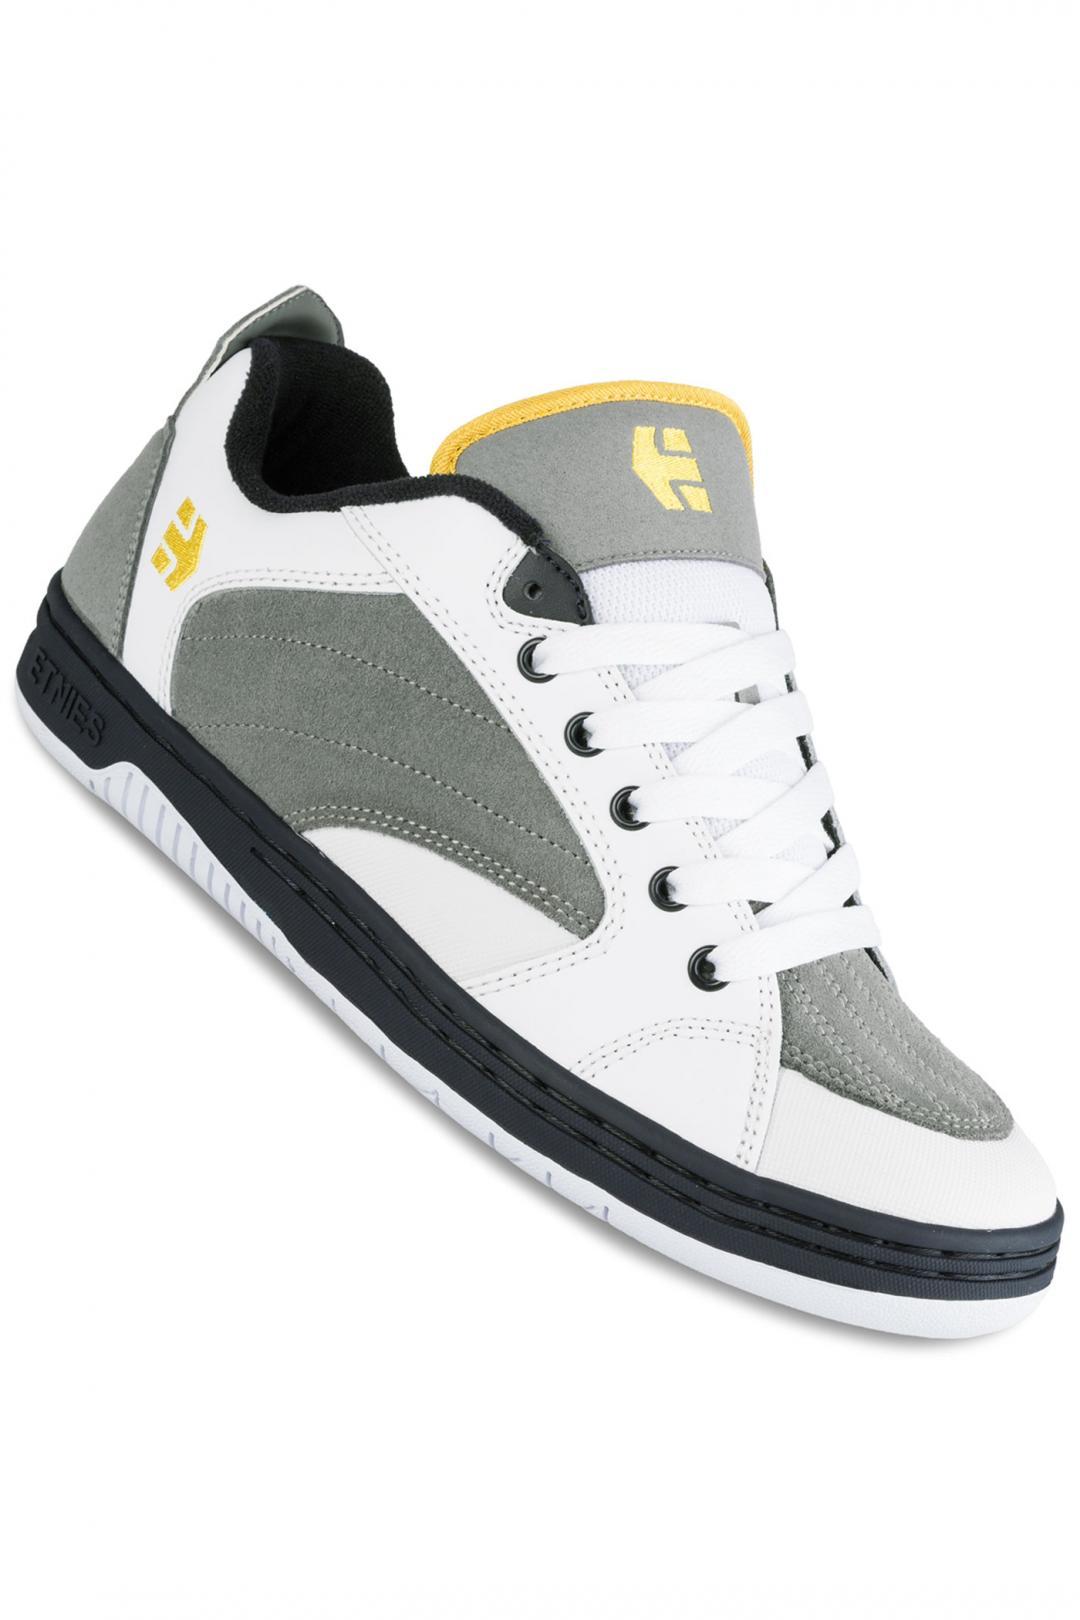 Uomo Etnies Czar white grey navy | Sneakers low top